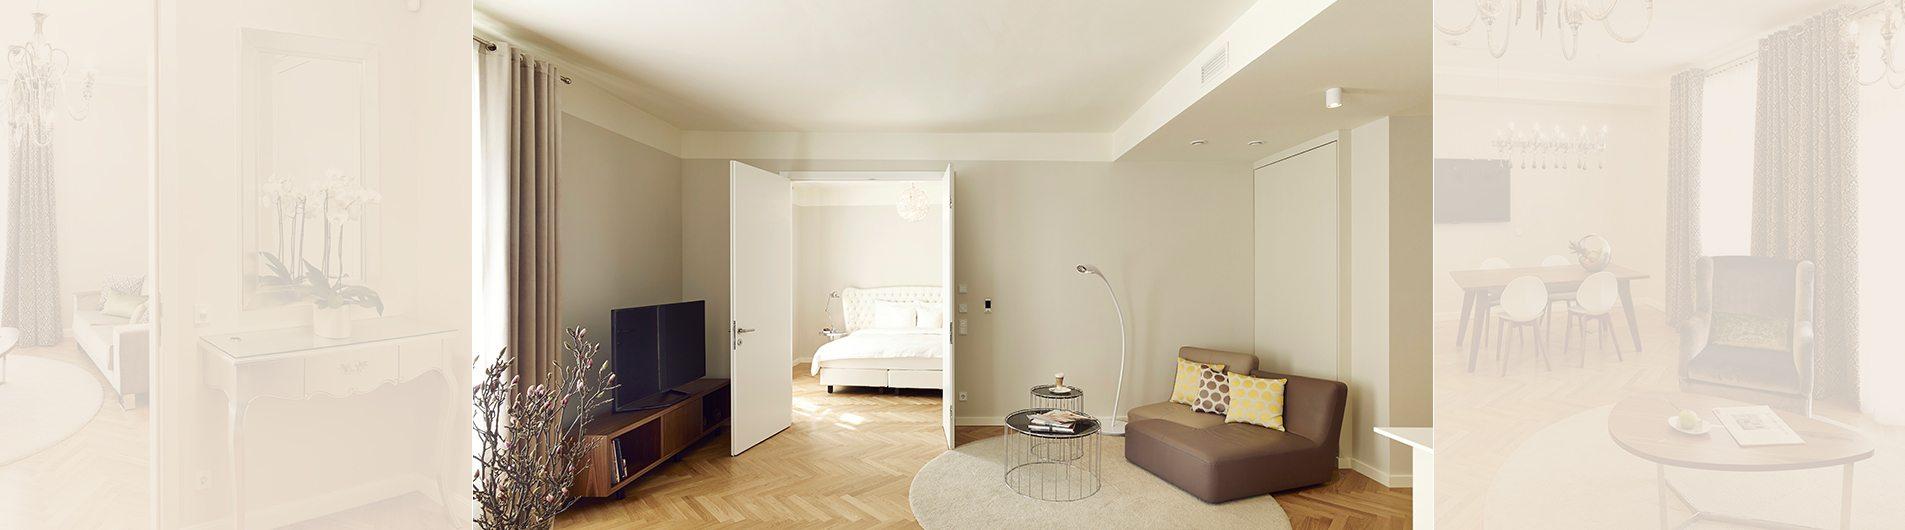 Hotel Sans Souci - Longstay Appartement